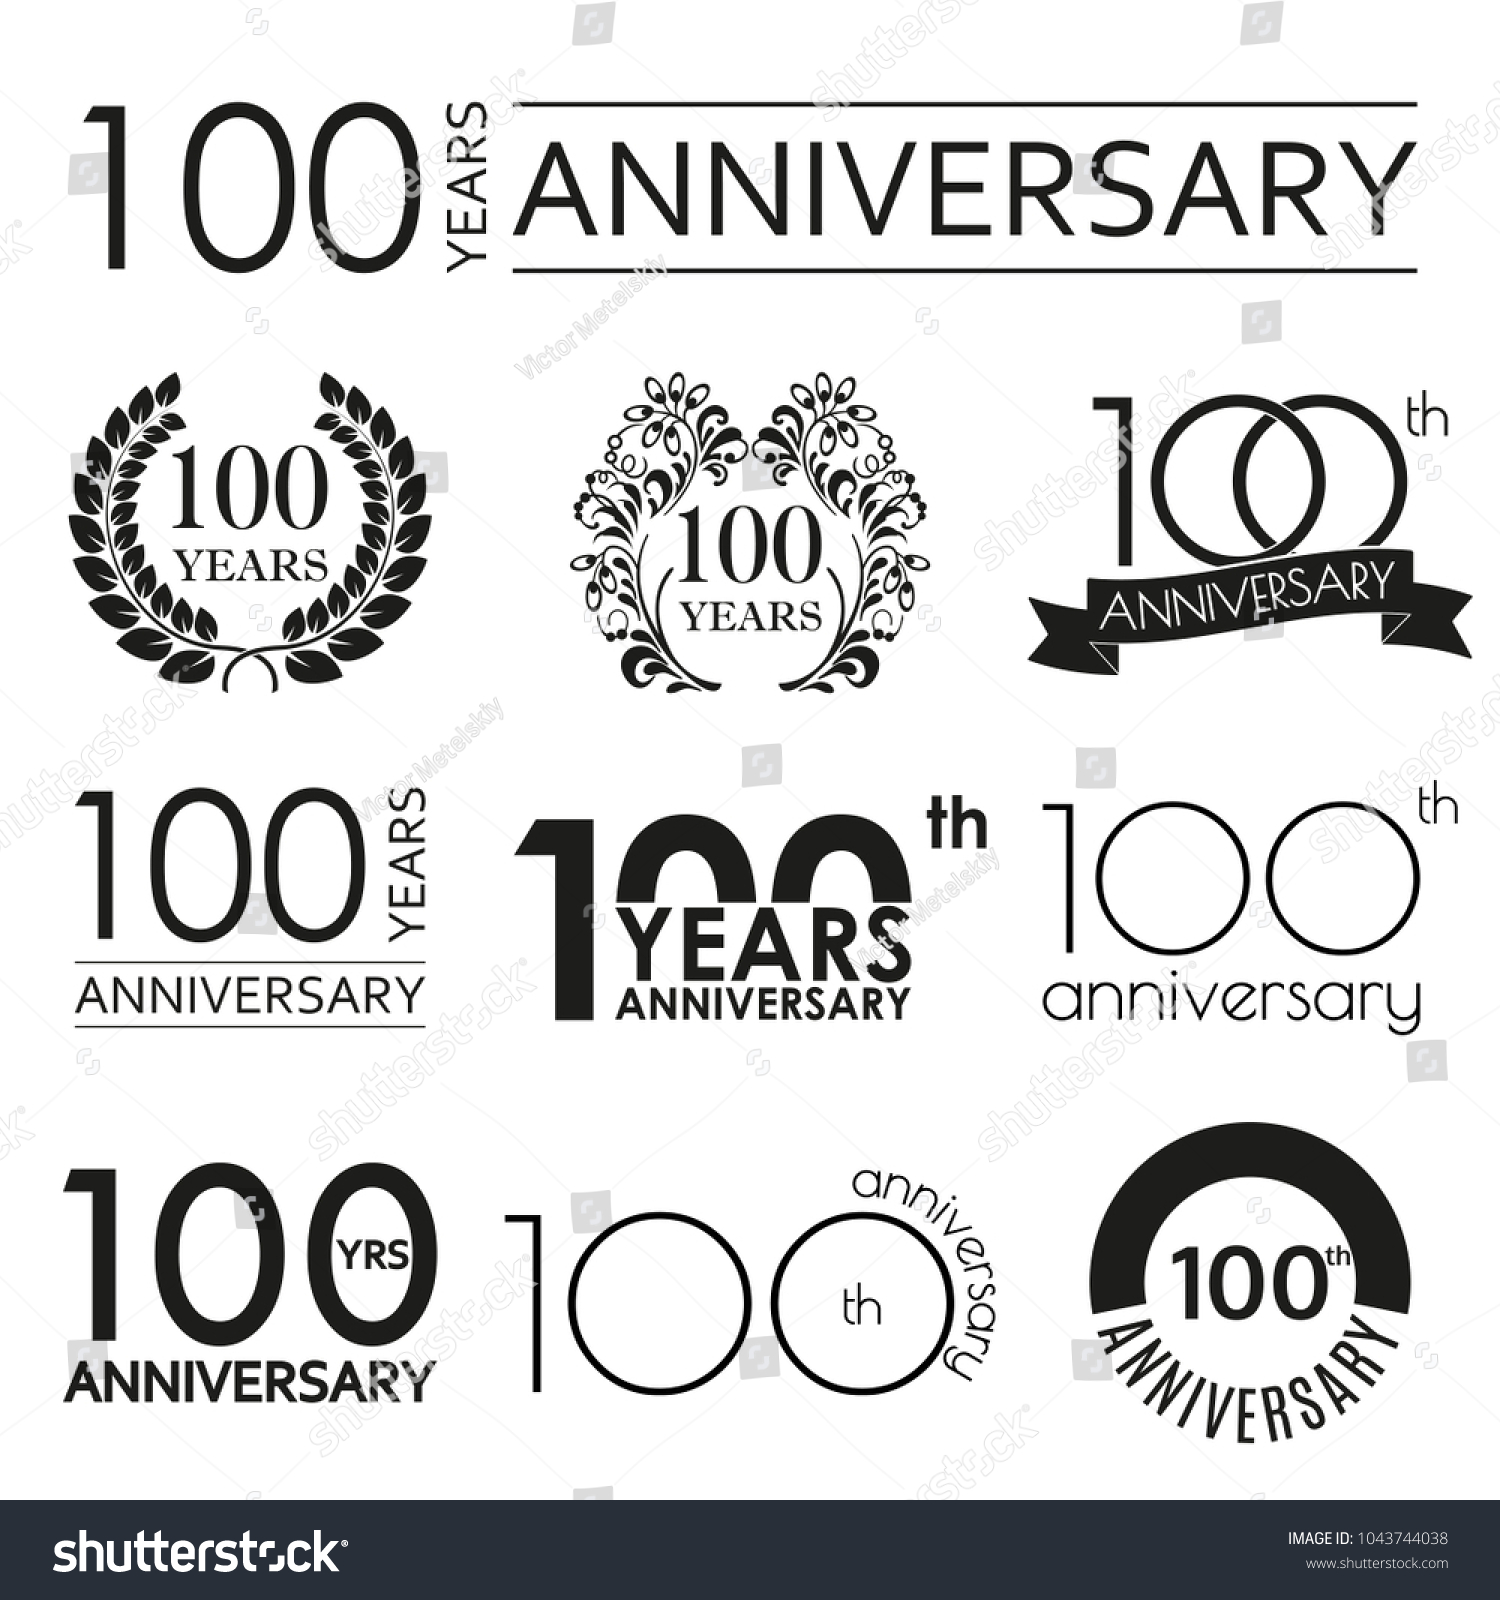 100 years anniversary icon set 100th のベクター画像素材